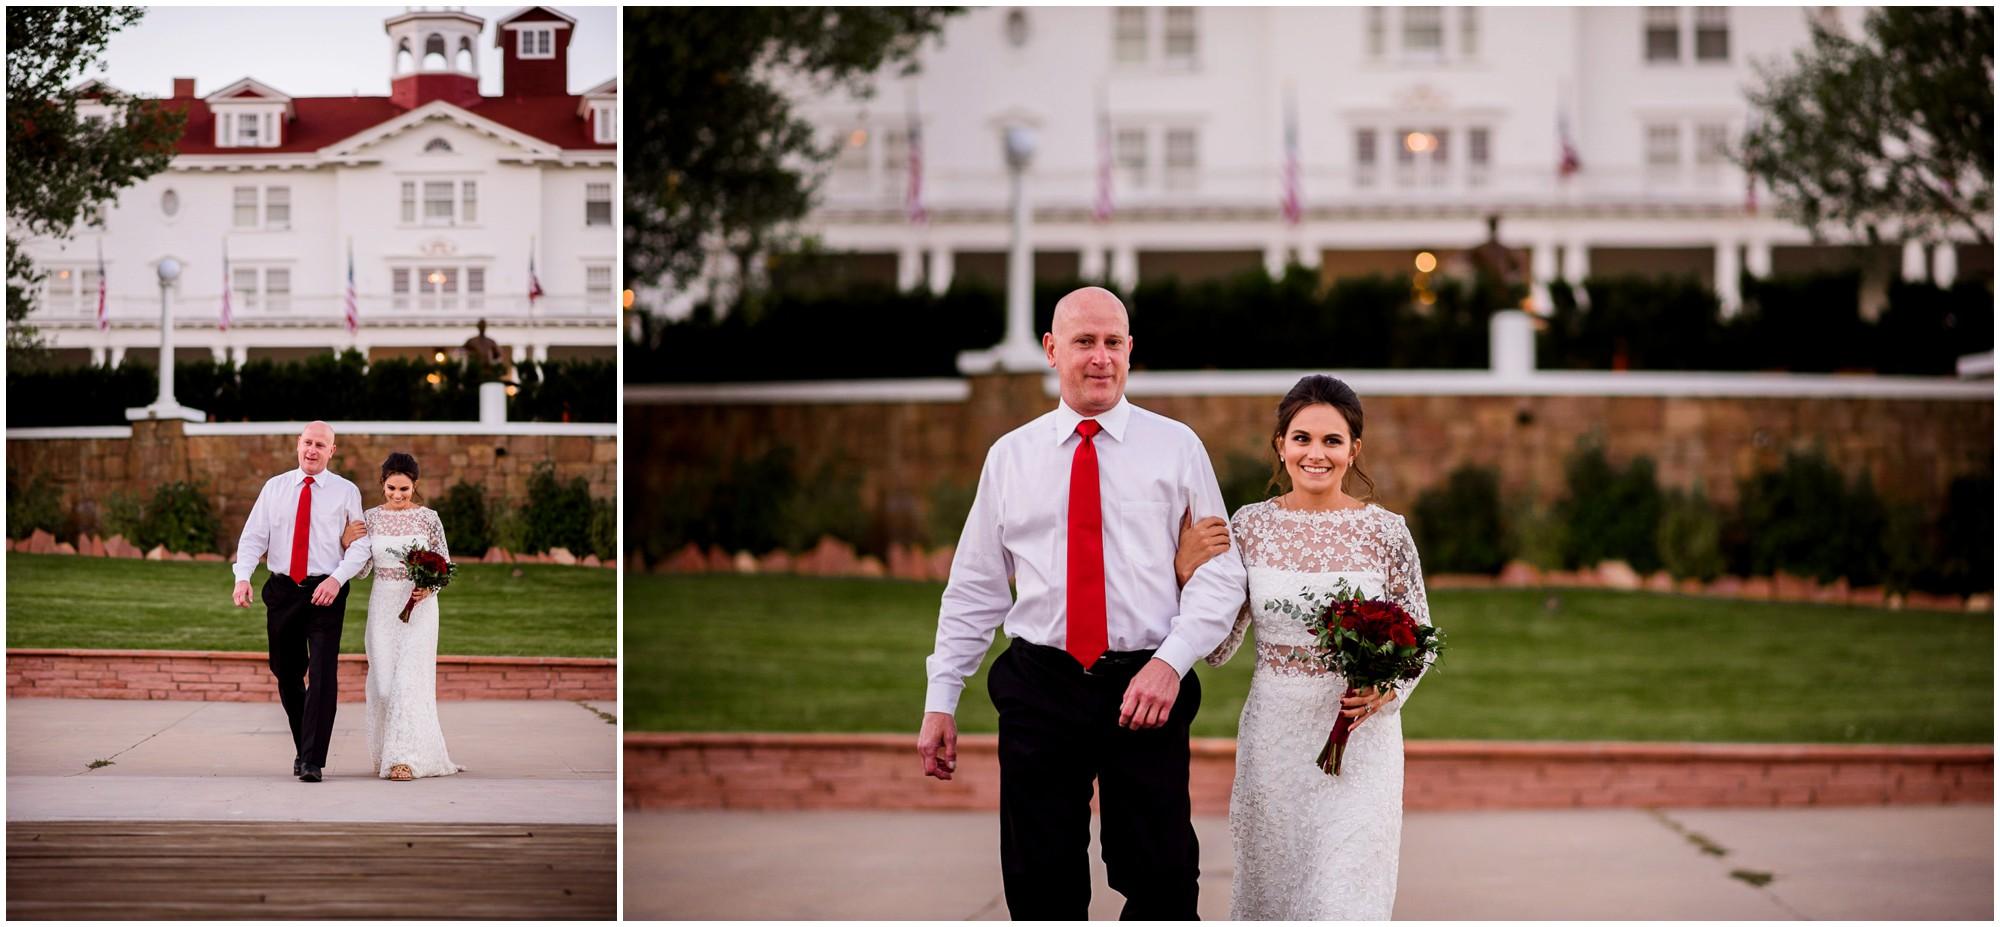 180-Estes-Park-Stanley-hotel-fall-wedding.jpg